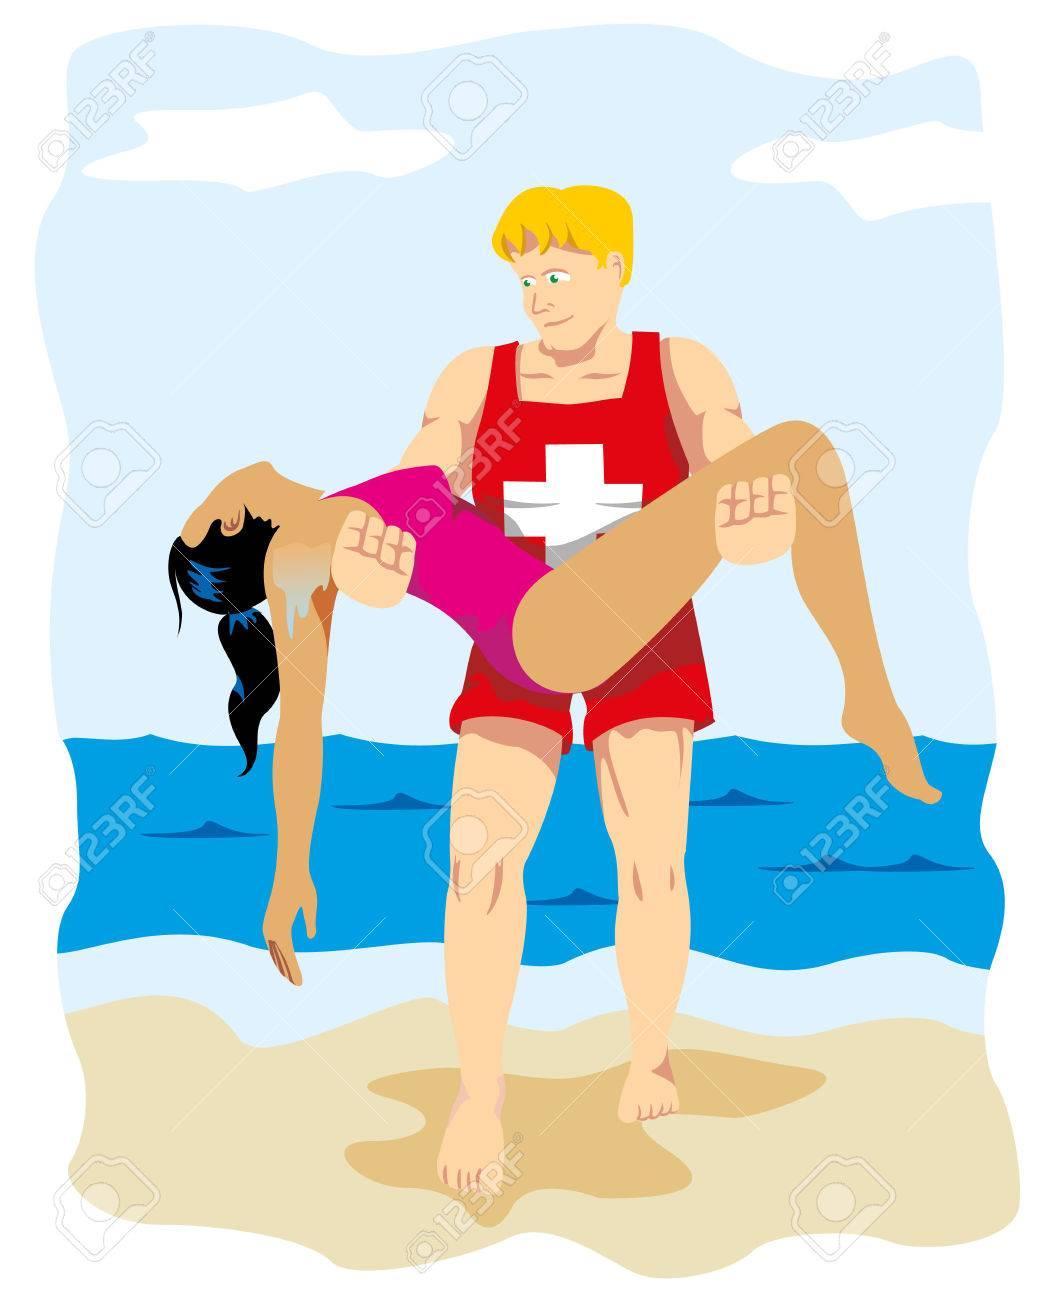 Saves lives by saving drowning victim - 72105111